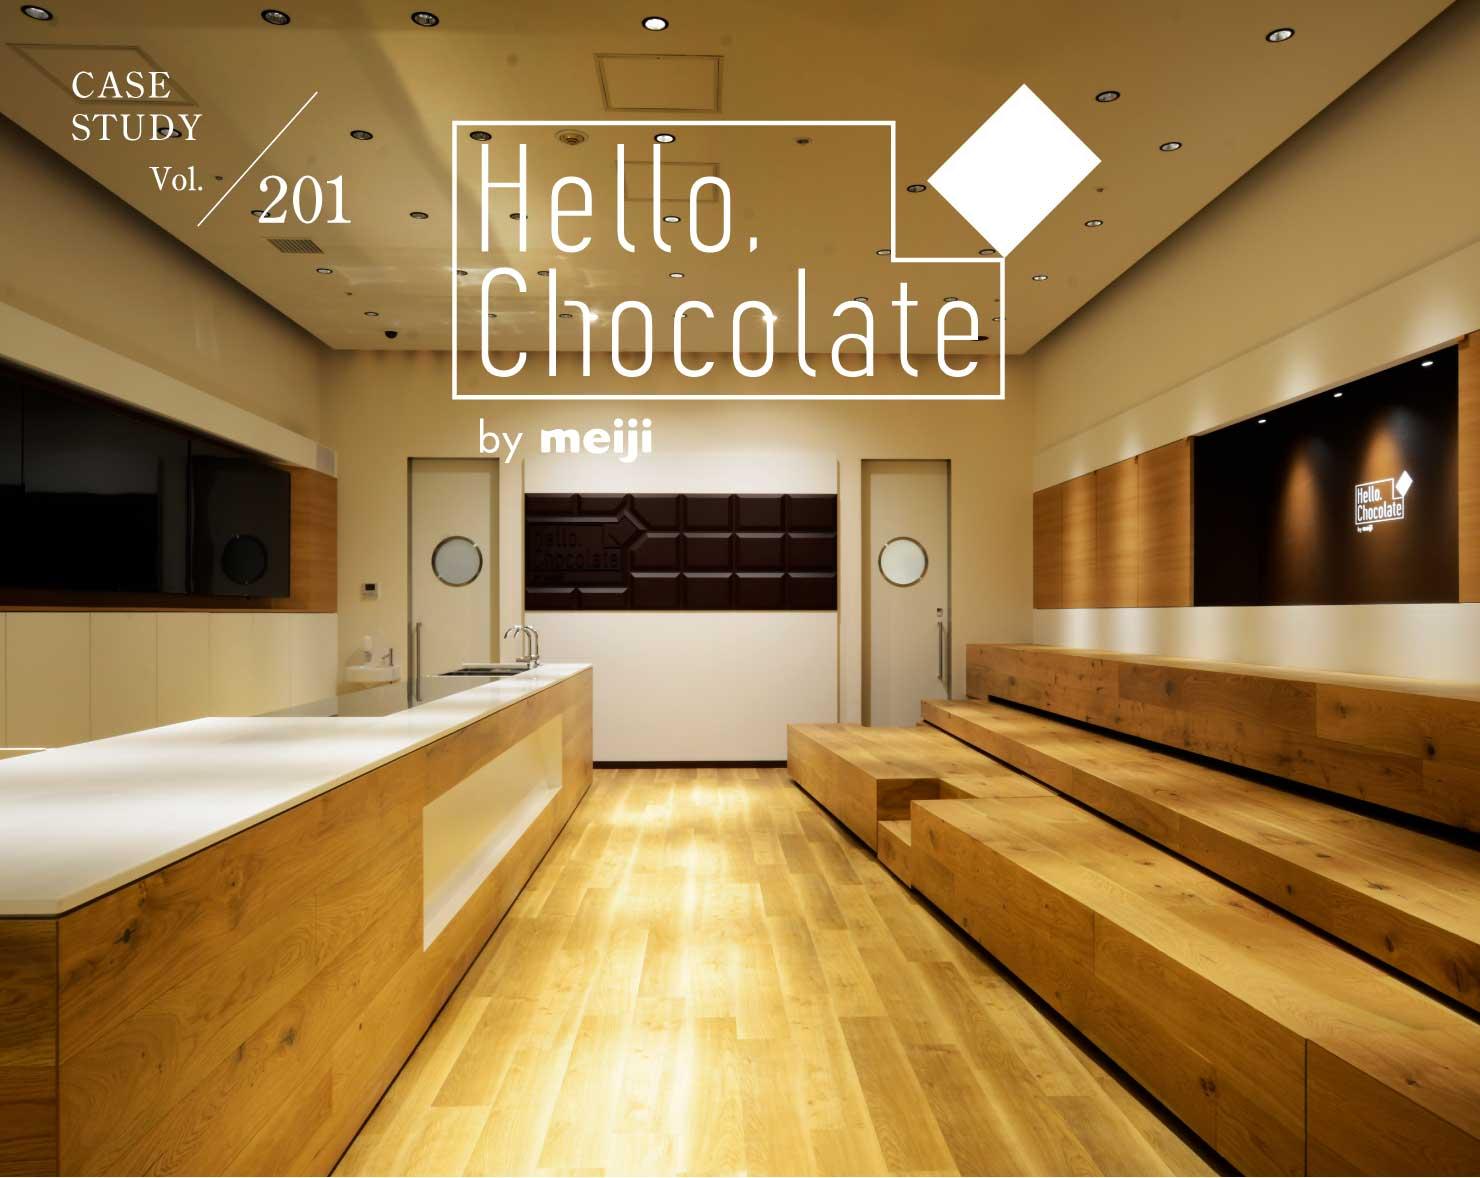 CASE STUDY Vol.201 Hello,Chocolate by meiji